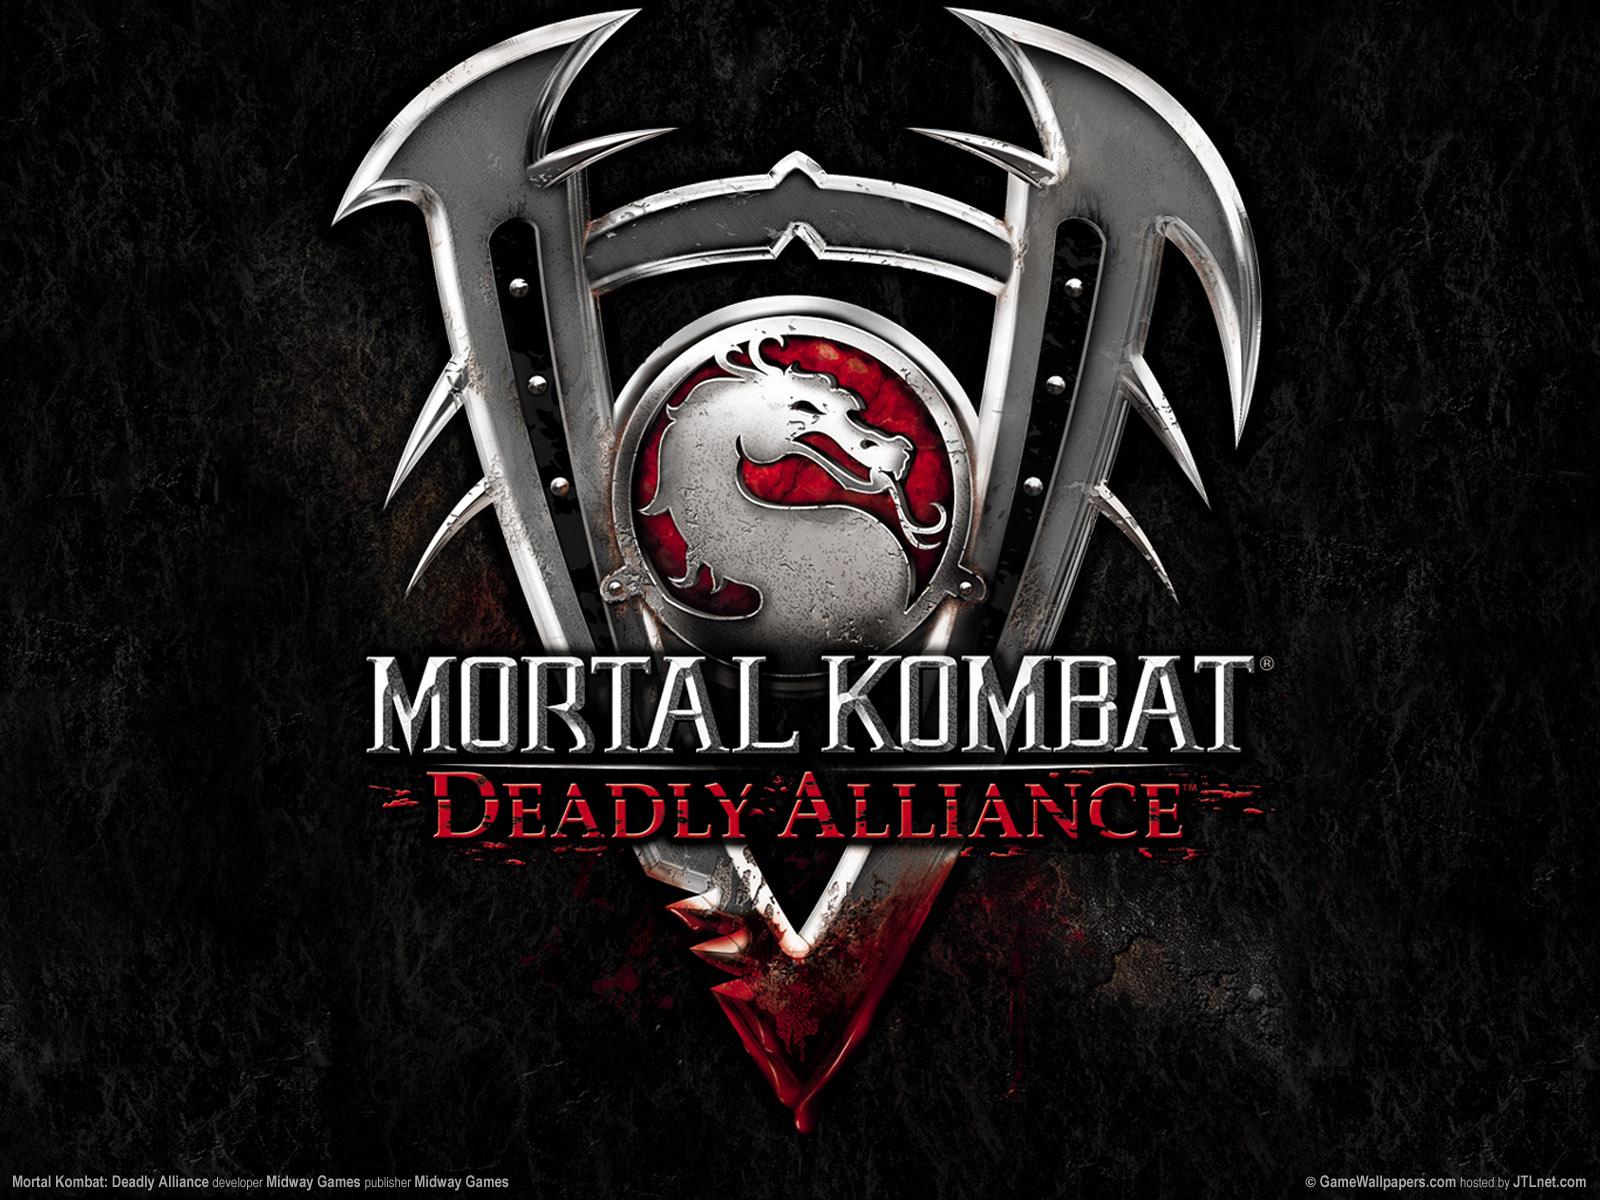 A Million Of Wallpapers Com Mortal Kombat Deadly Alliance